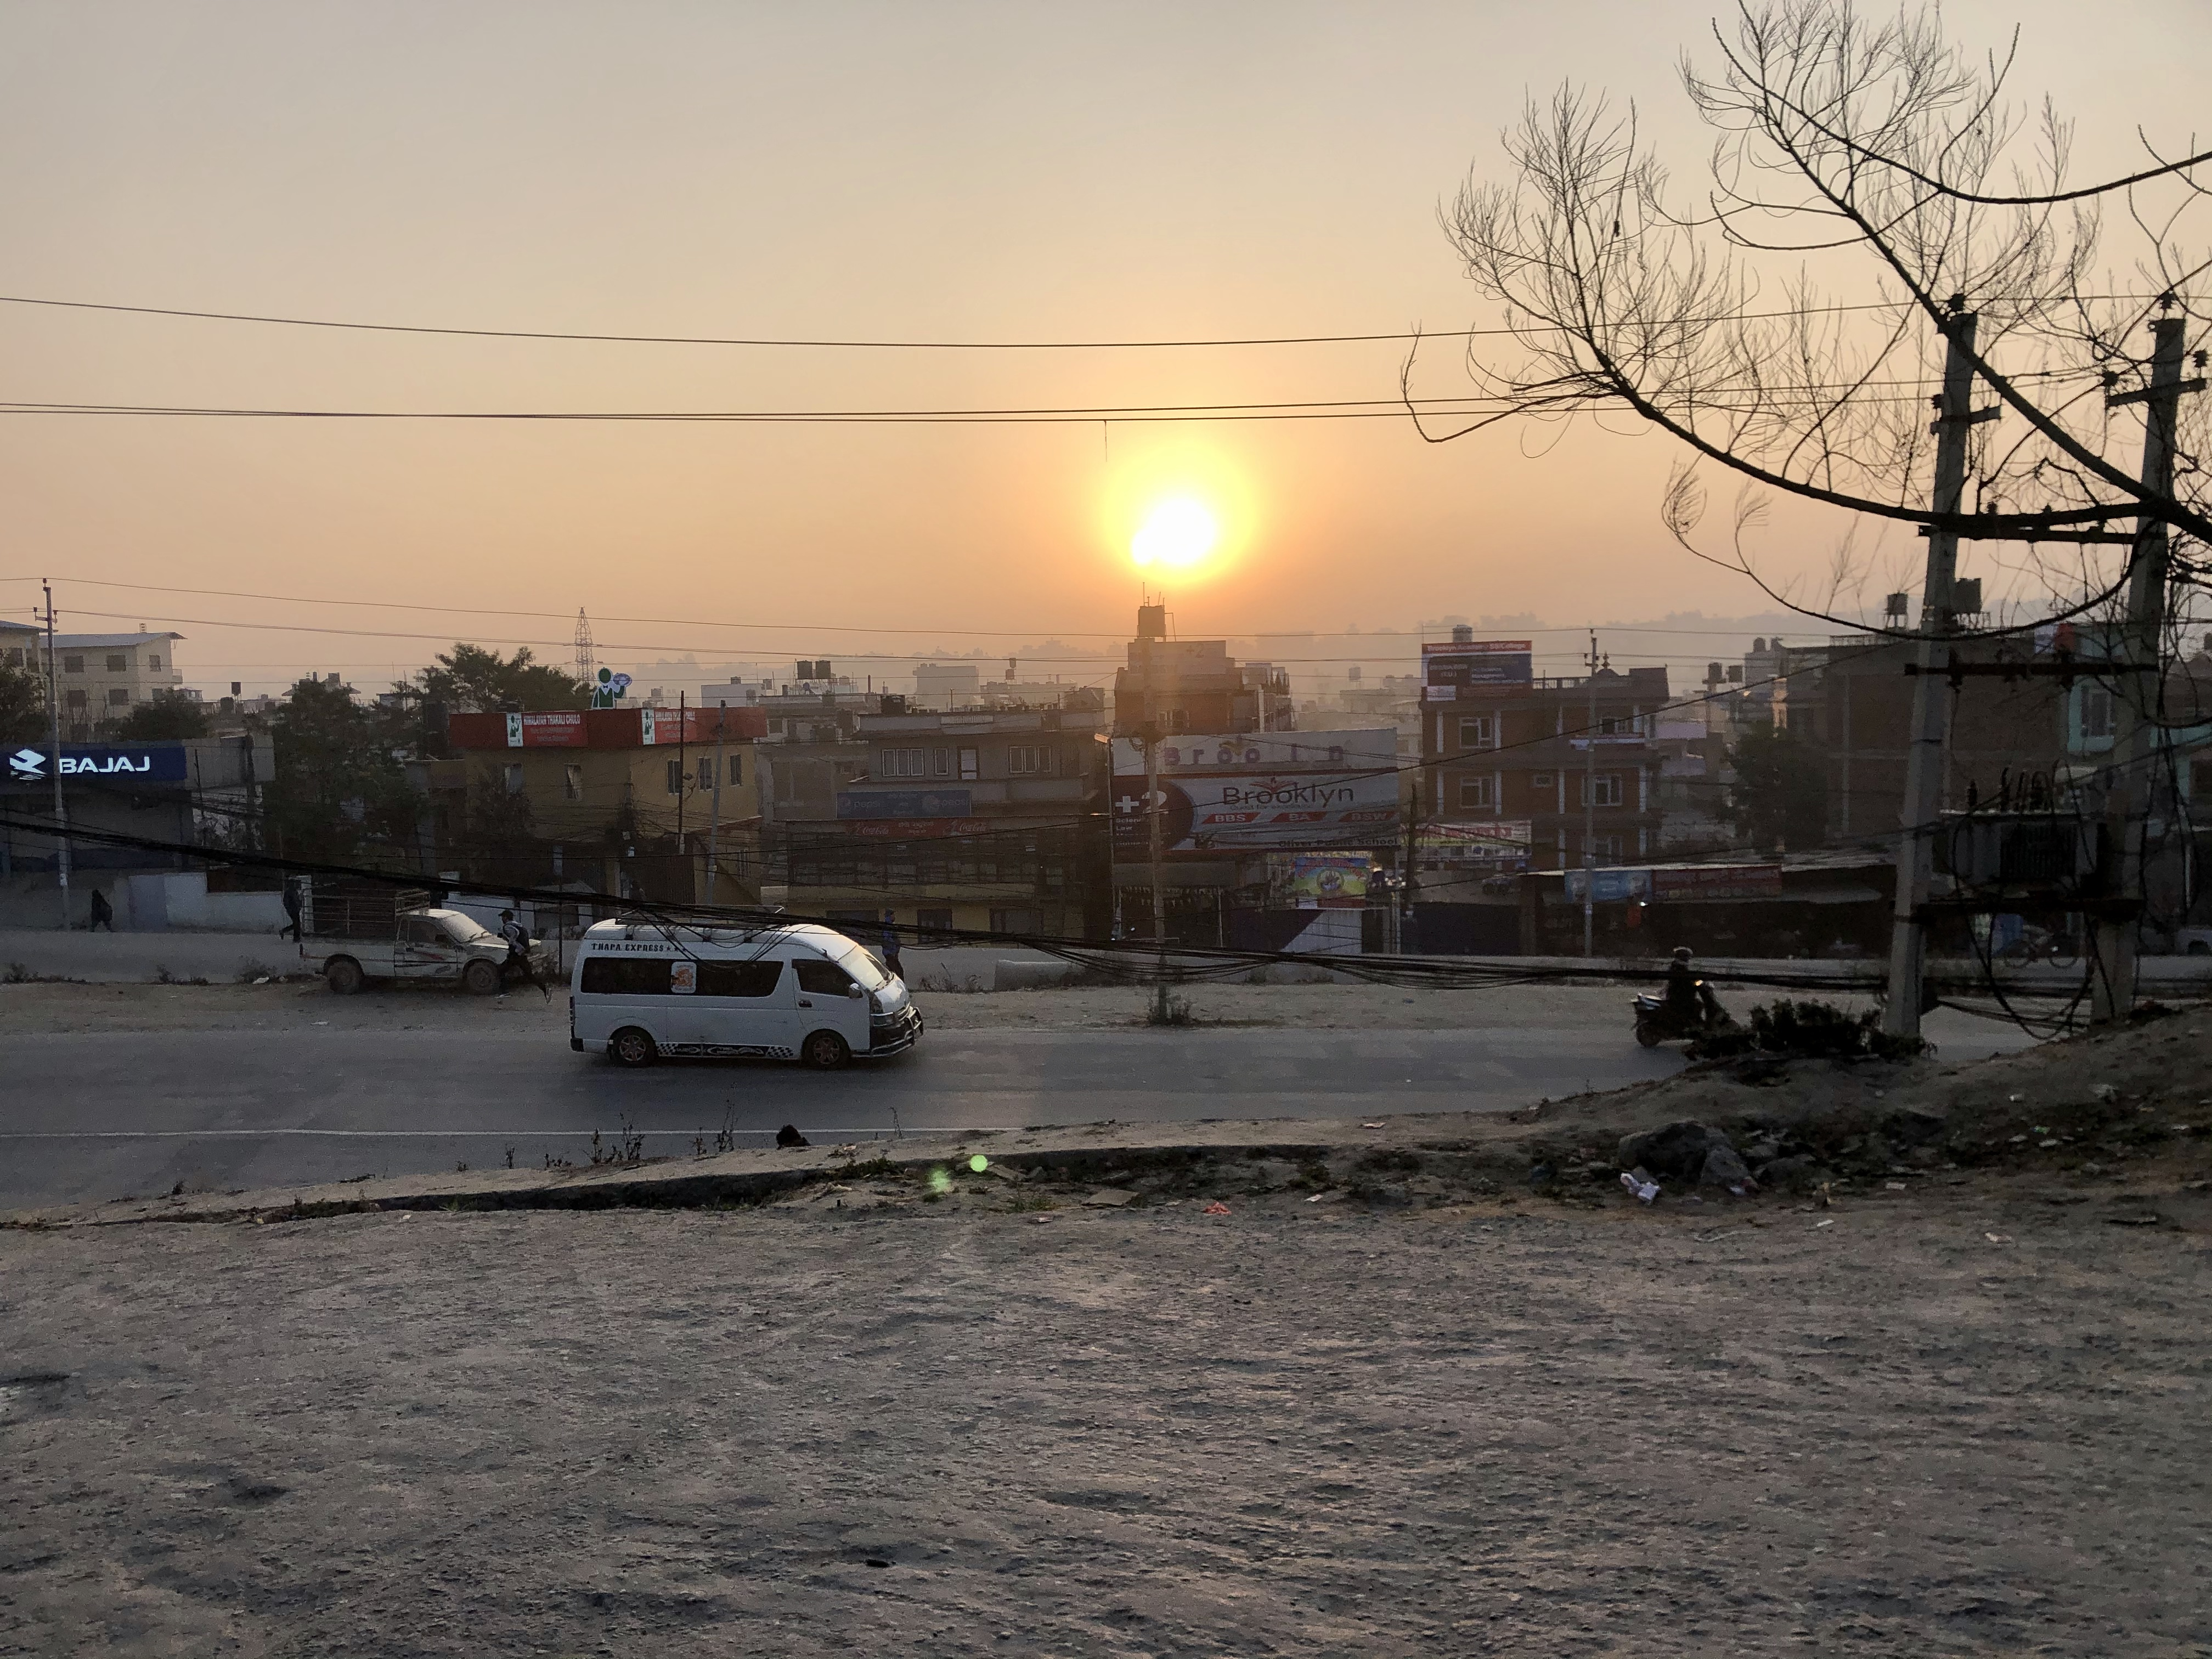 View of Sukedhara, Kathmandu from my morning commute to school (Photo provided)